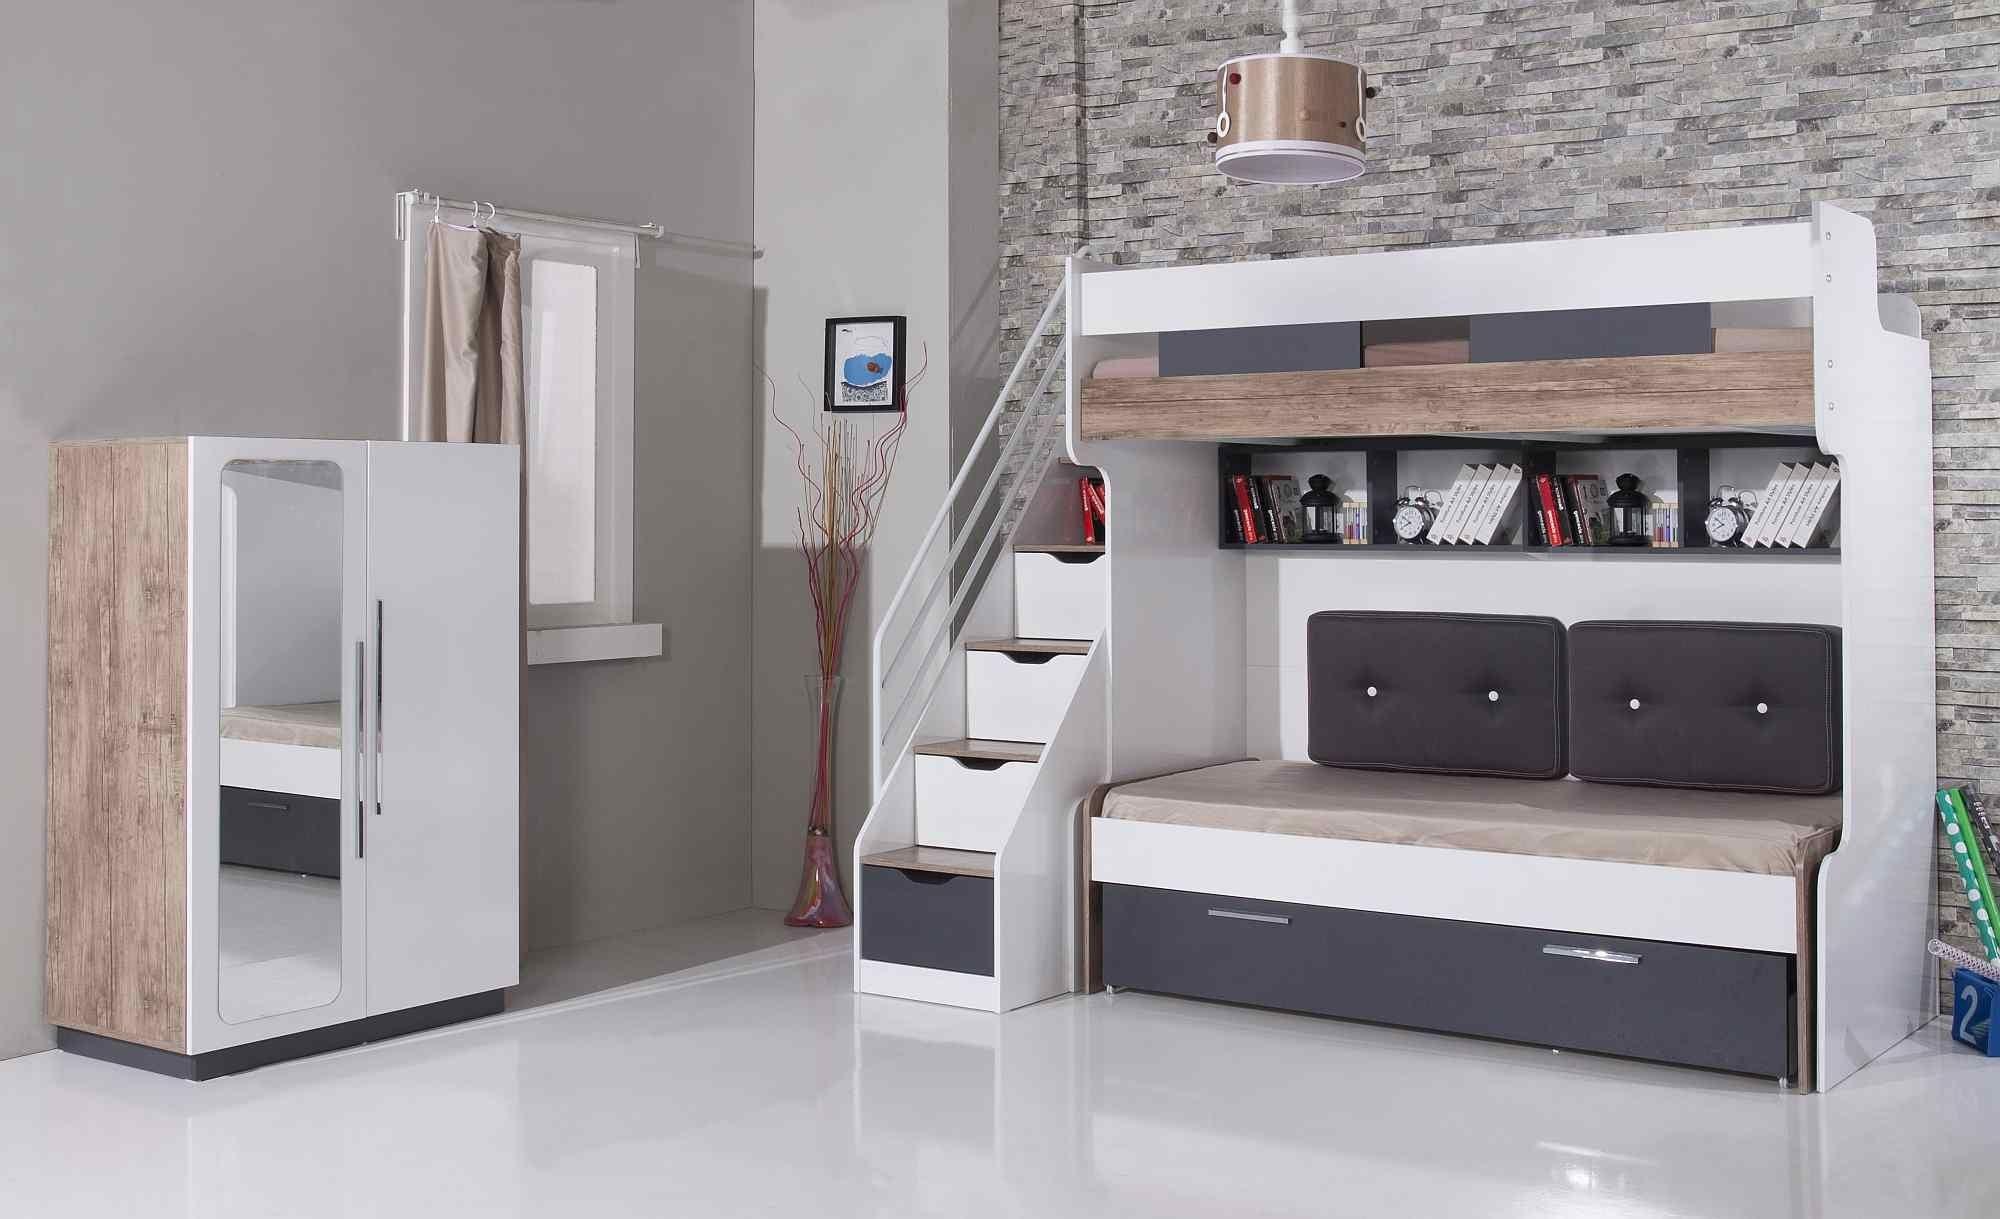 Multifunctionele Kinderkamer Meubel : Compact hoogslaper multifunctioneel bed multifunctionele